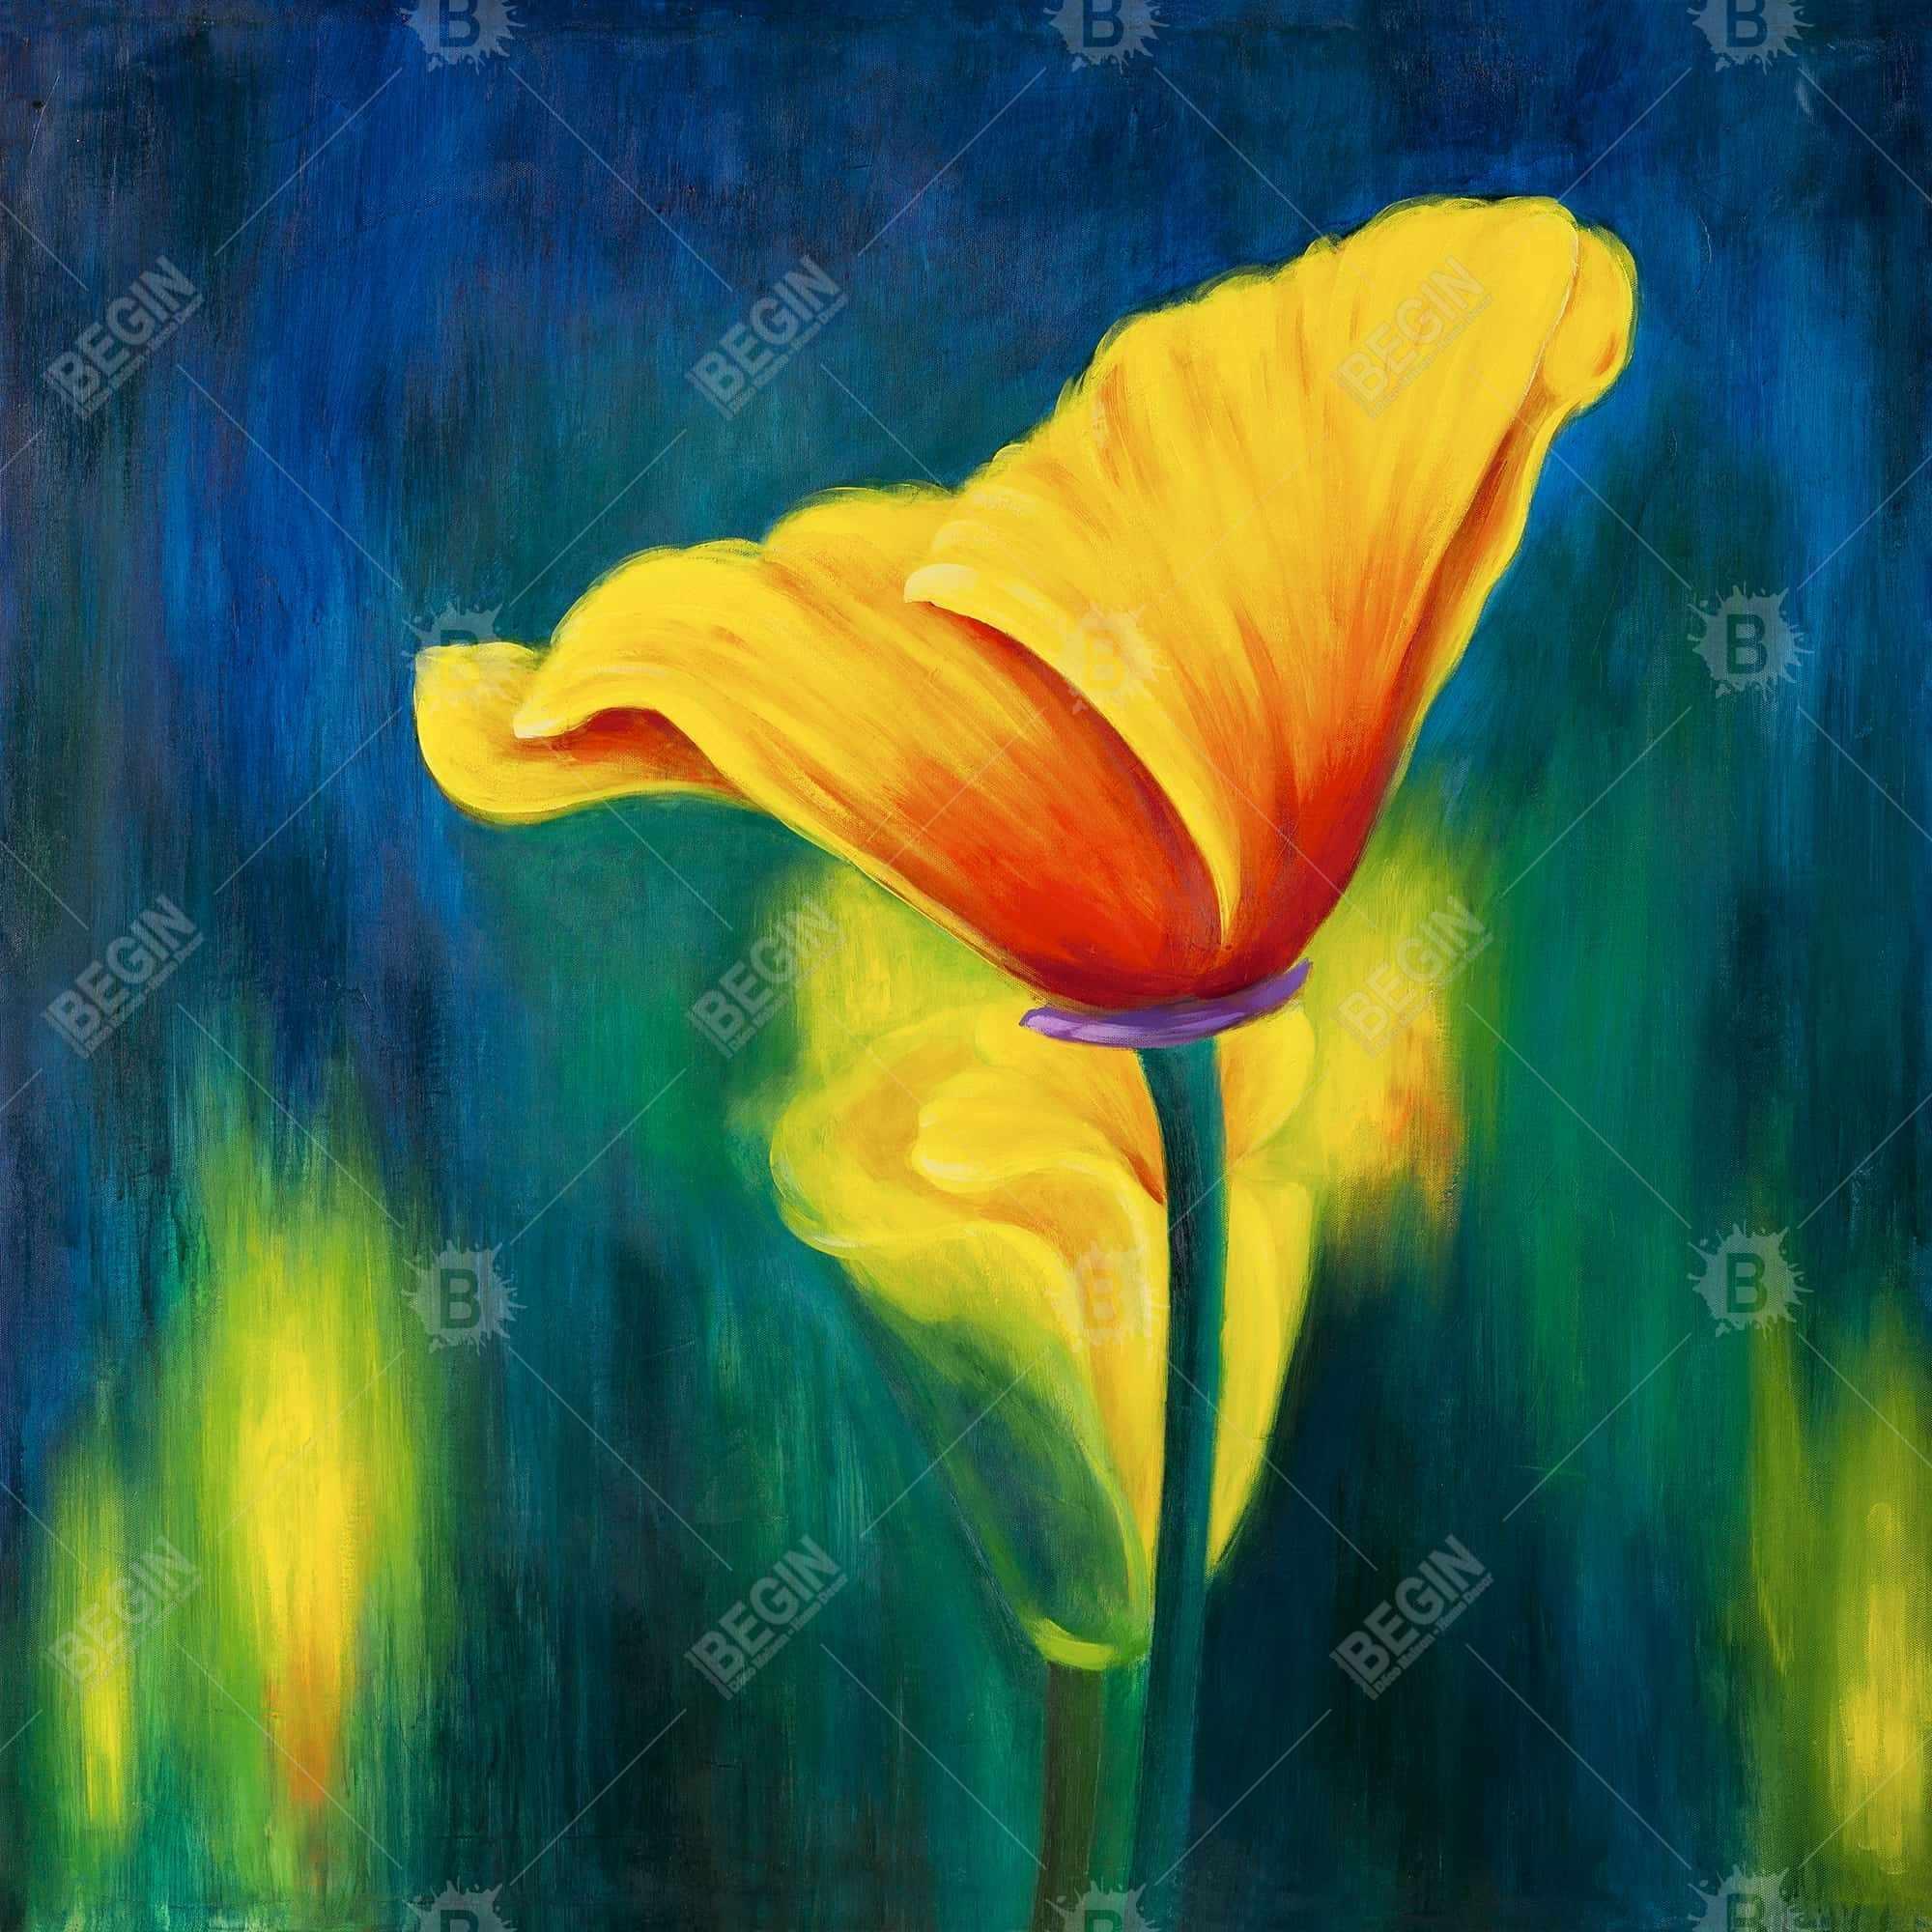 Superb contrast flowers